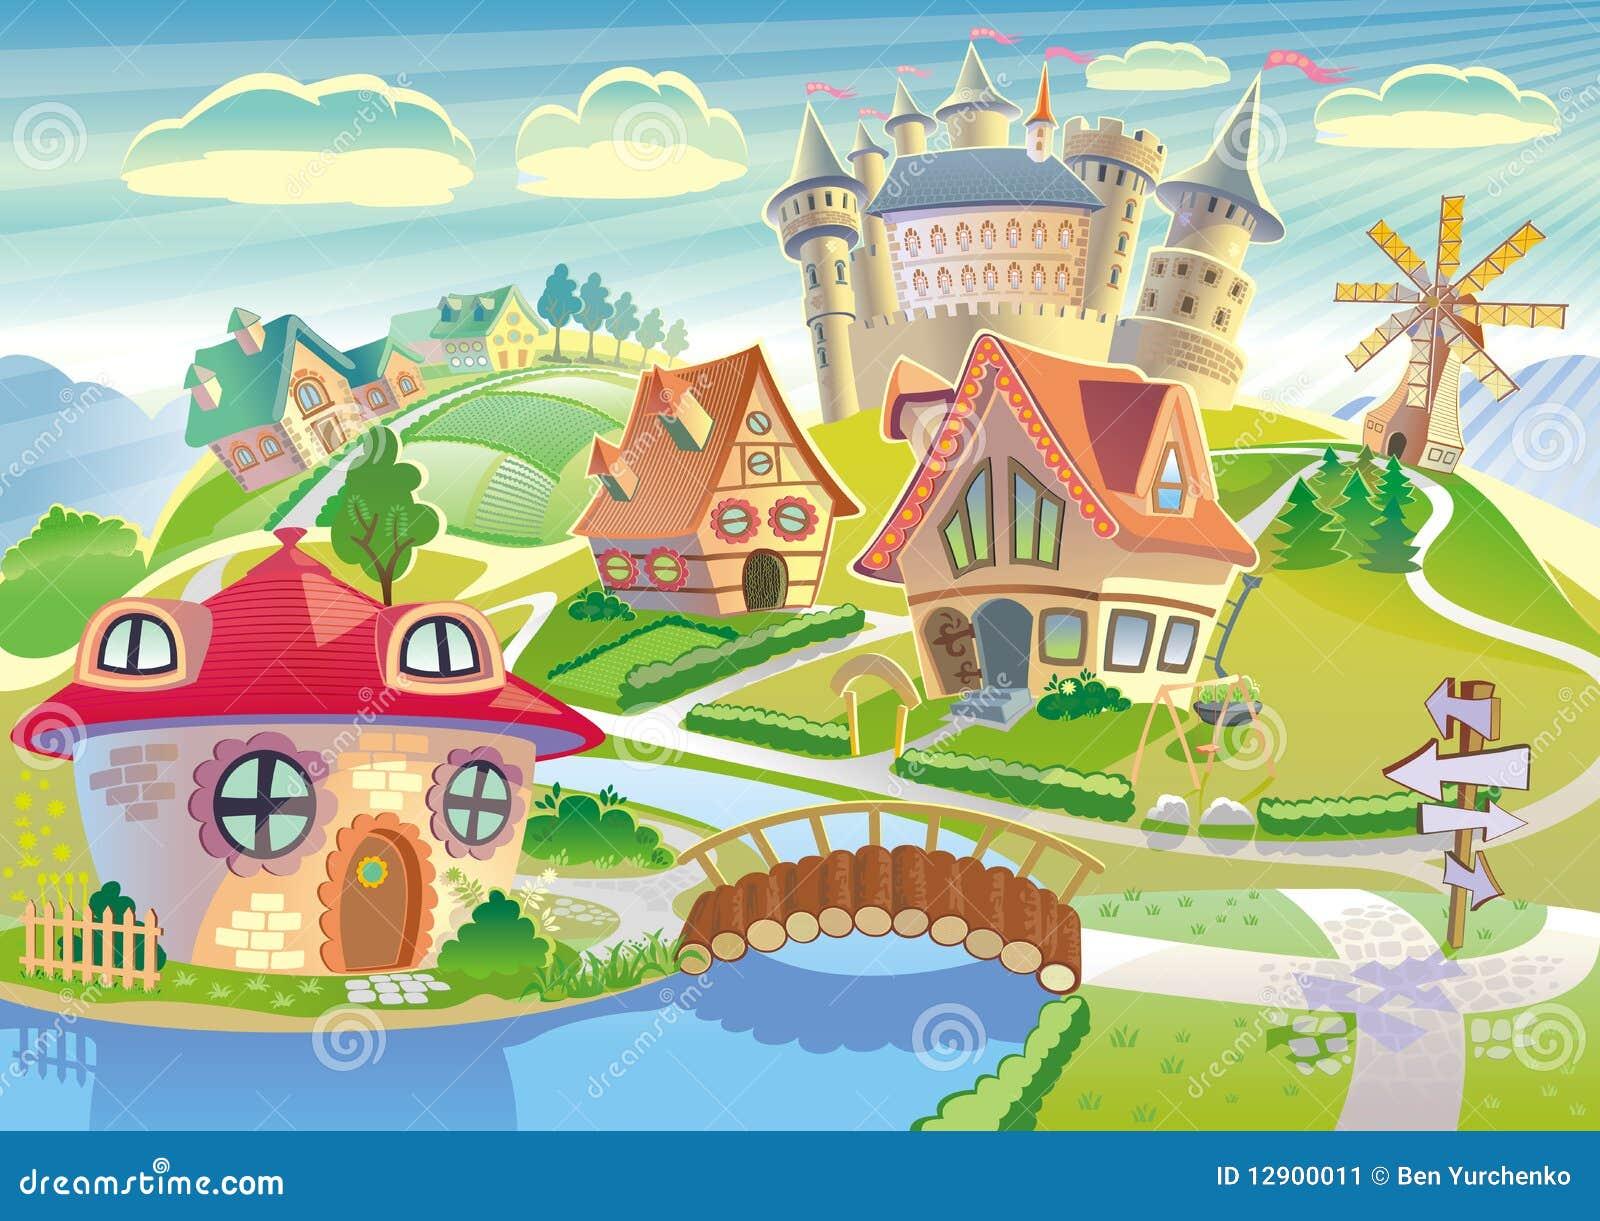 Fairyland with castle, windmill and littler cute village in a cartoon ... Fairyland